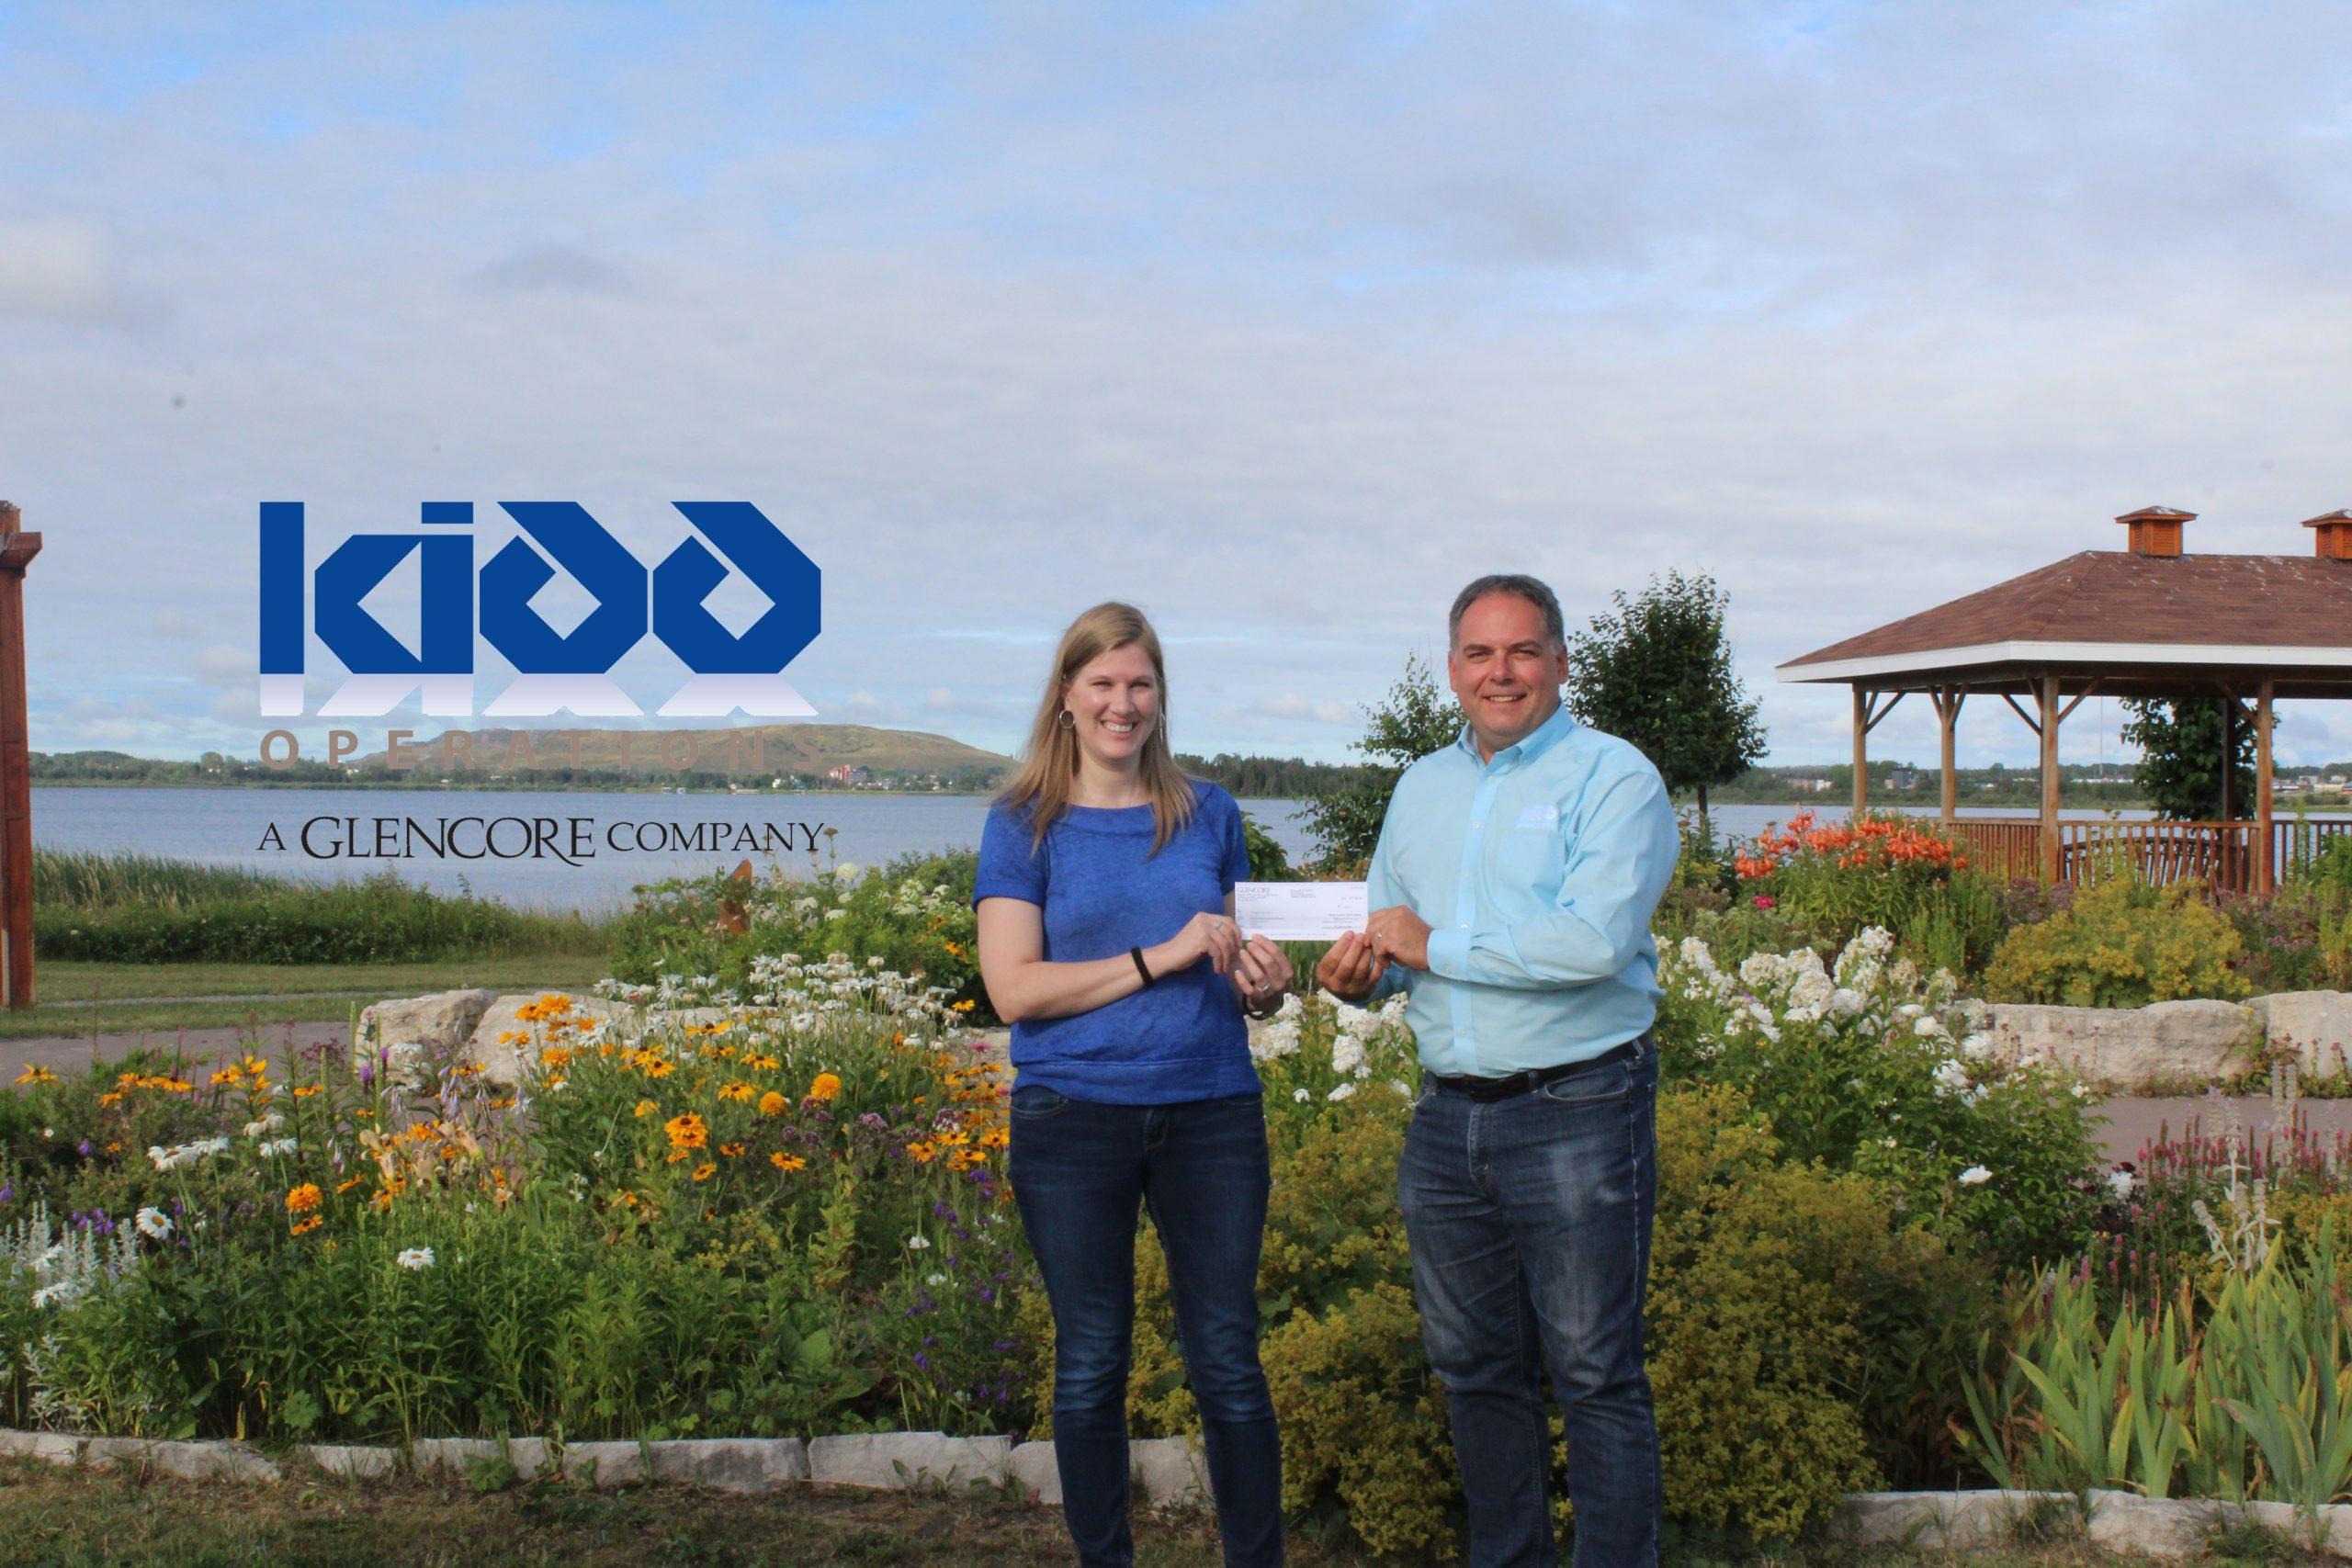 cheque presentation from Glencore Kidd Operations